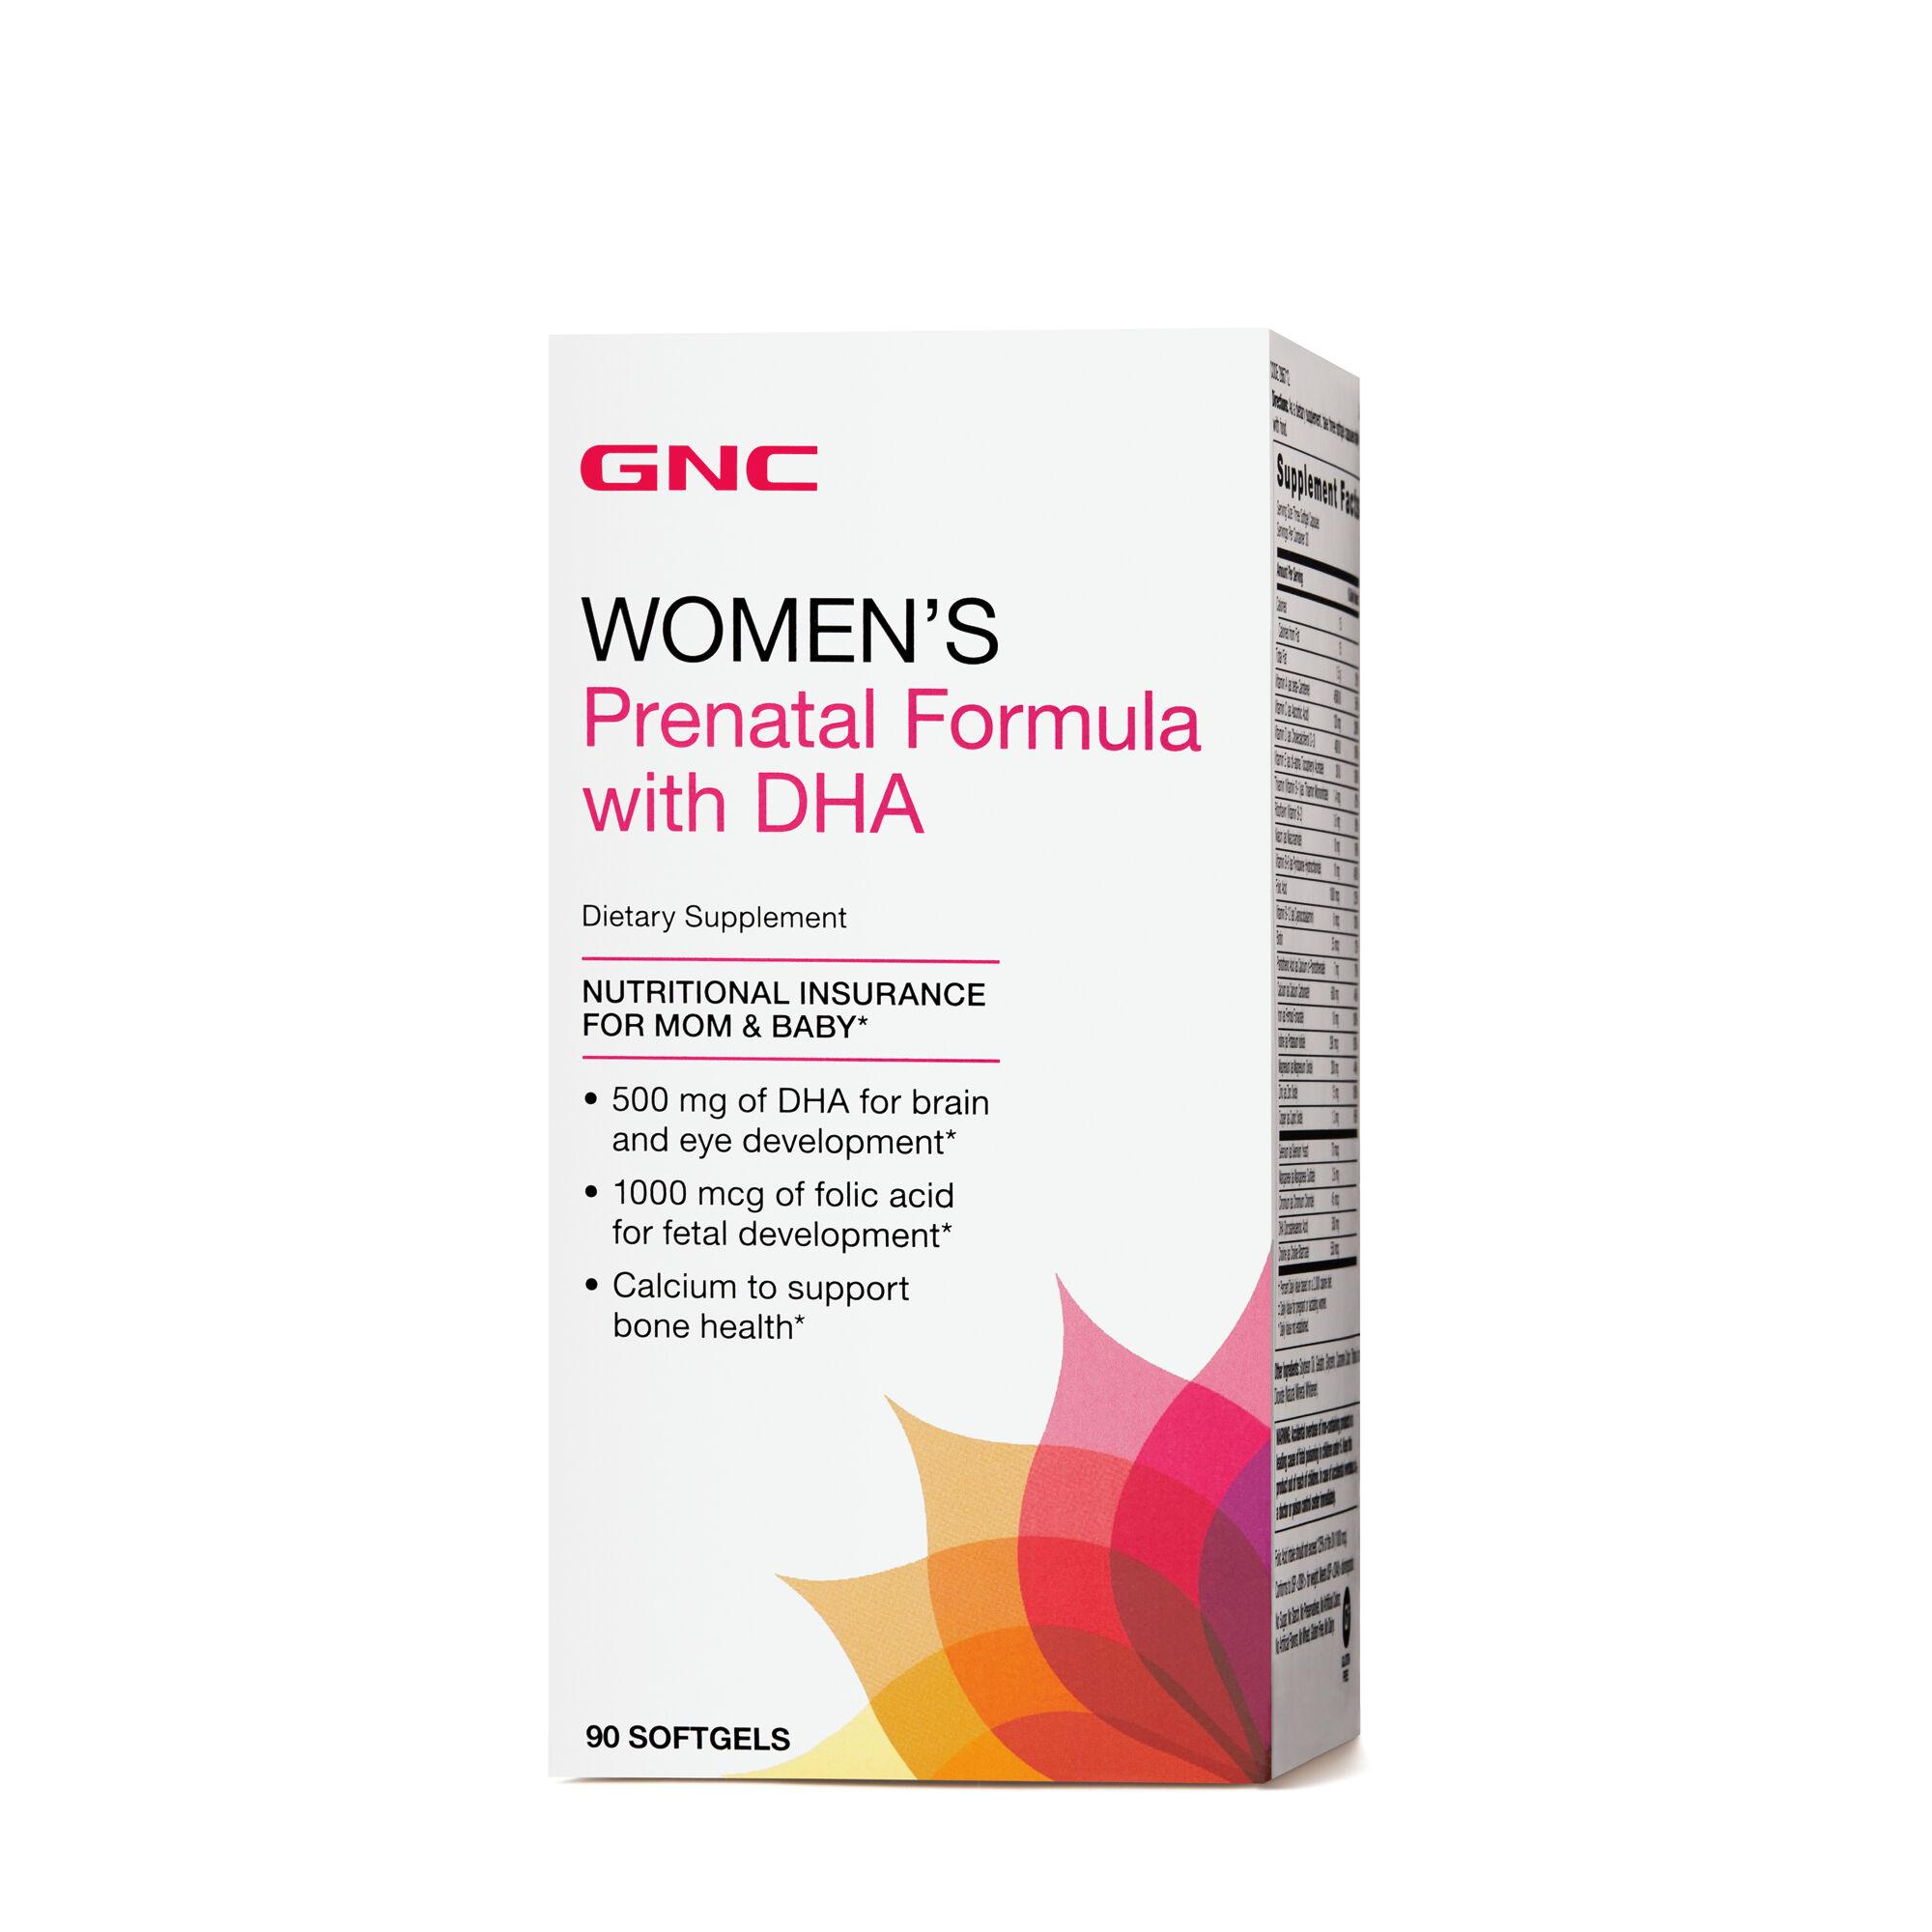 Women's Formula Dha With Gnc Prenatal 8on0pwnkx uTJc1lFK3